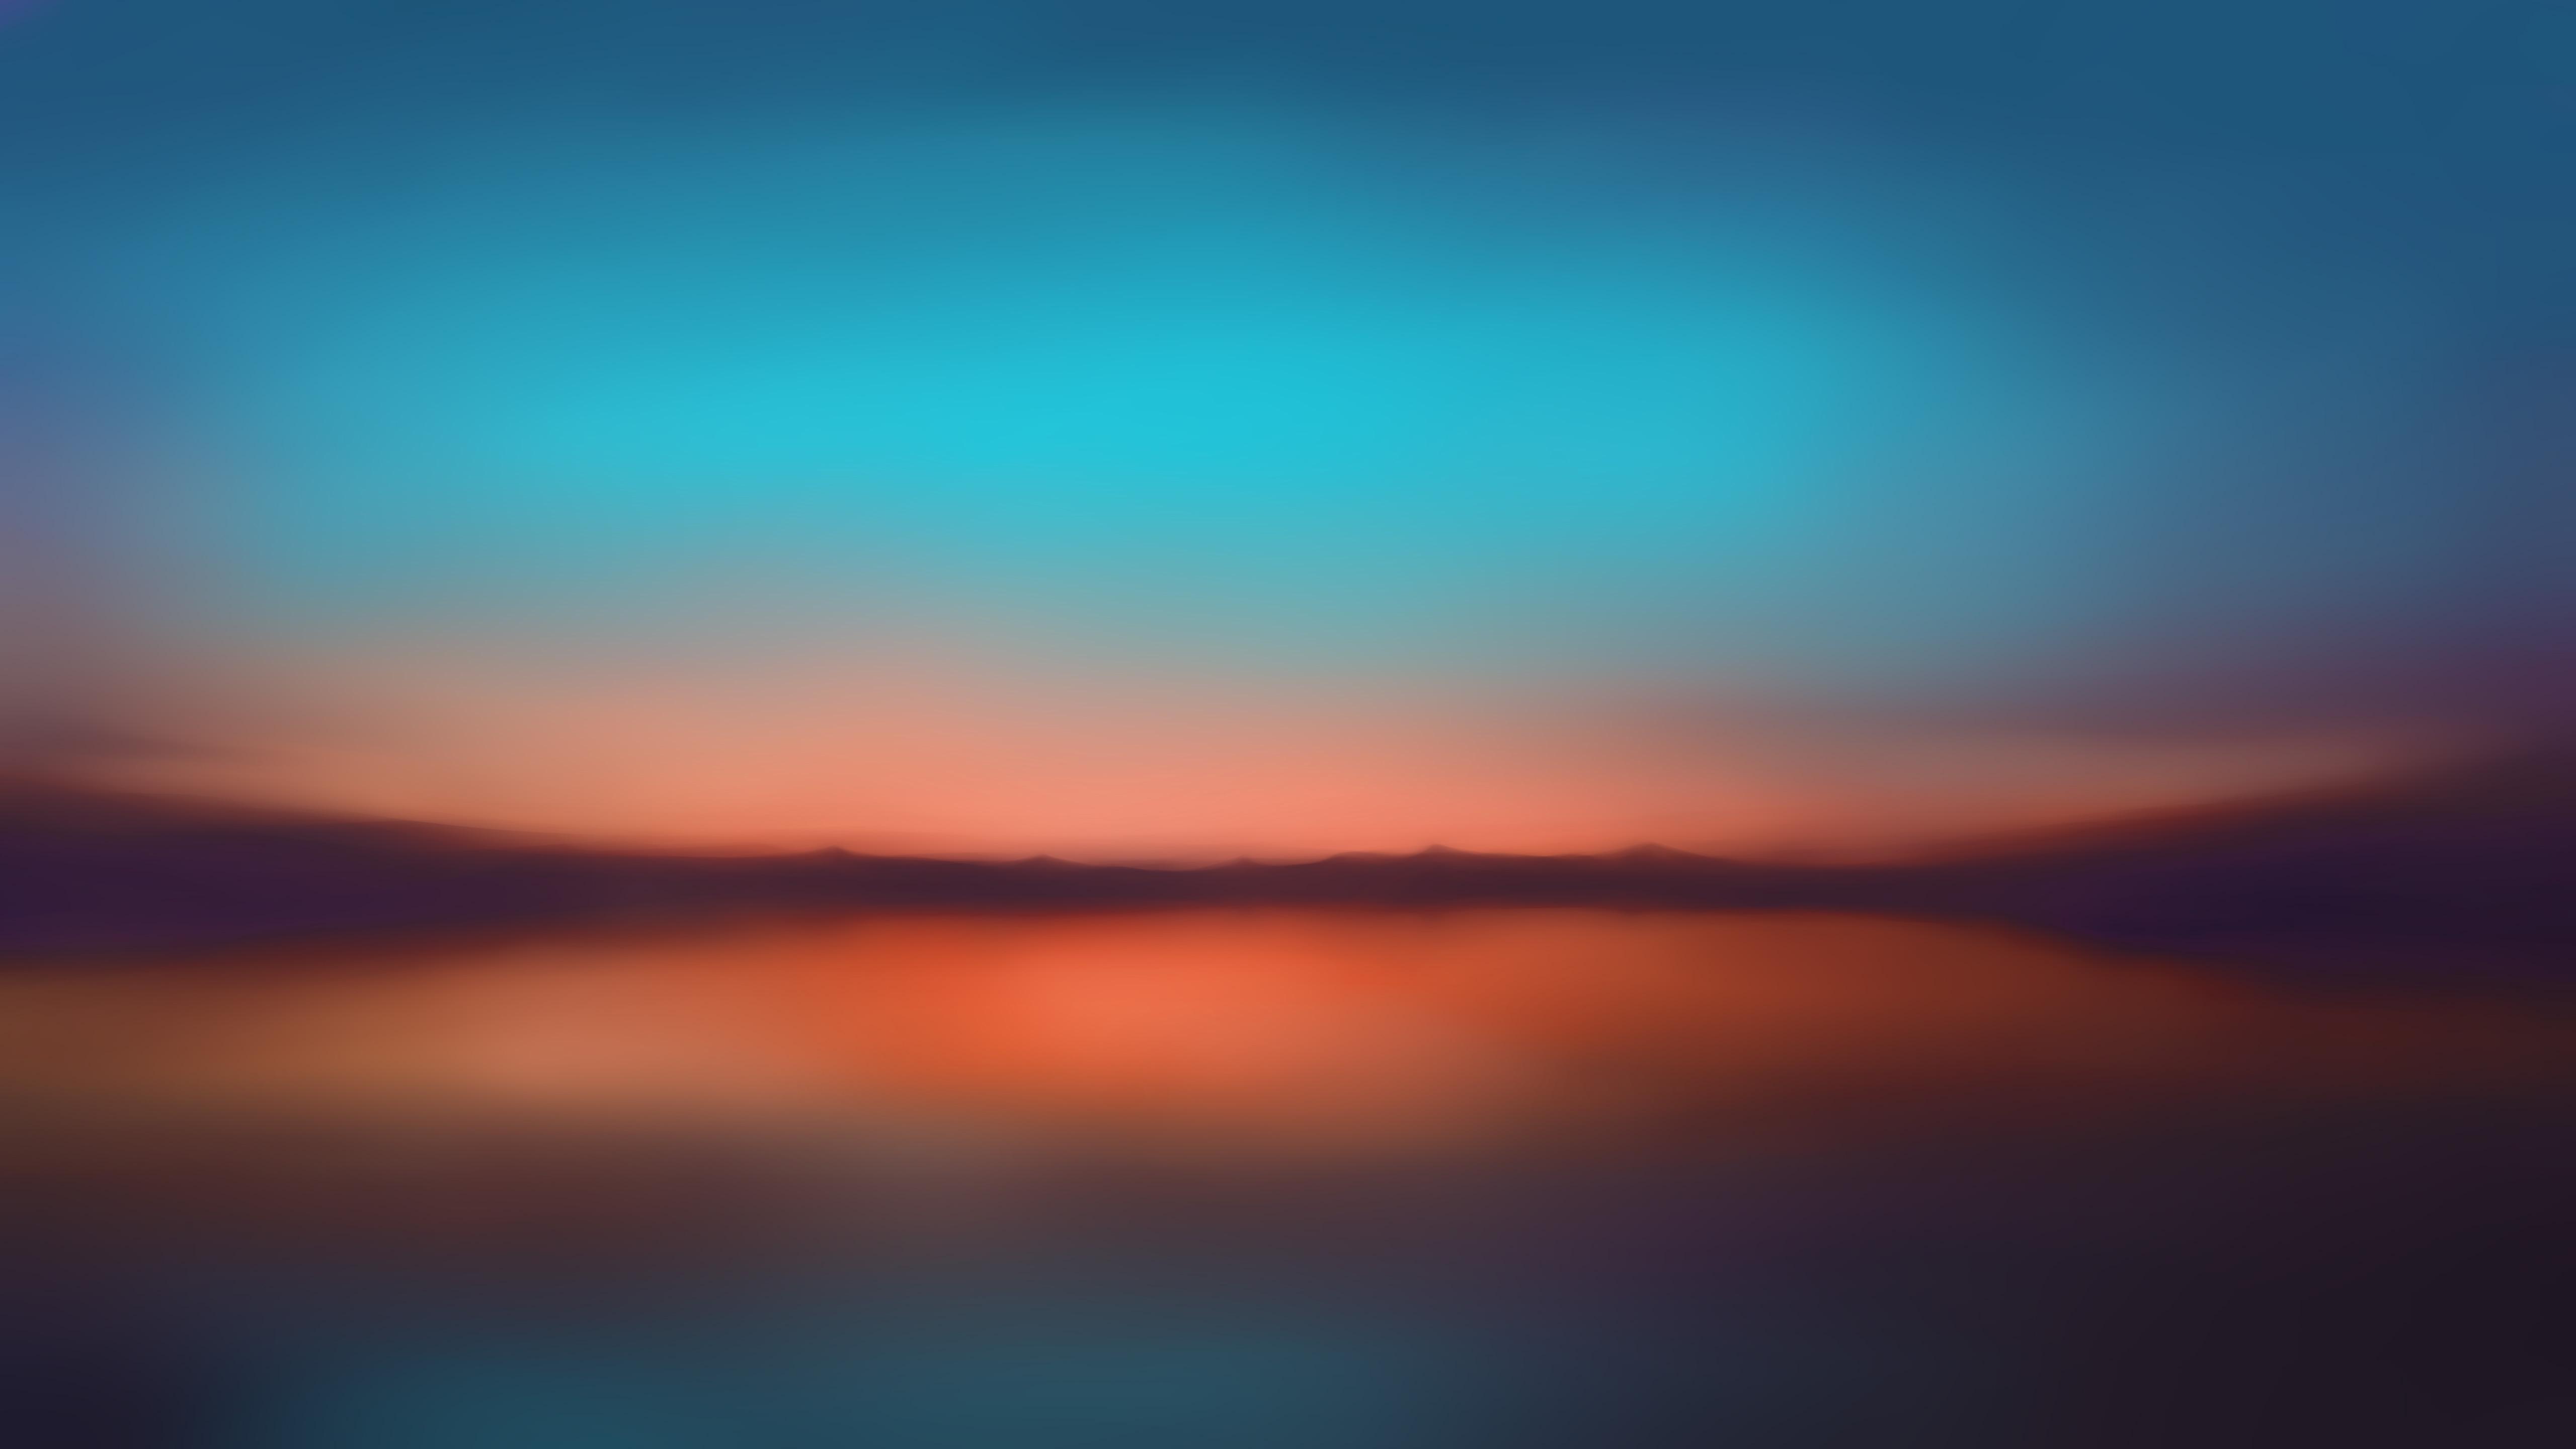 Orange Sunset Blur Minimalist 5k Hd Artist 4k Wallpapers